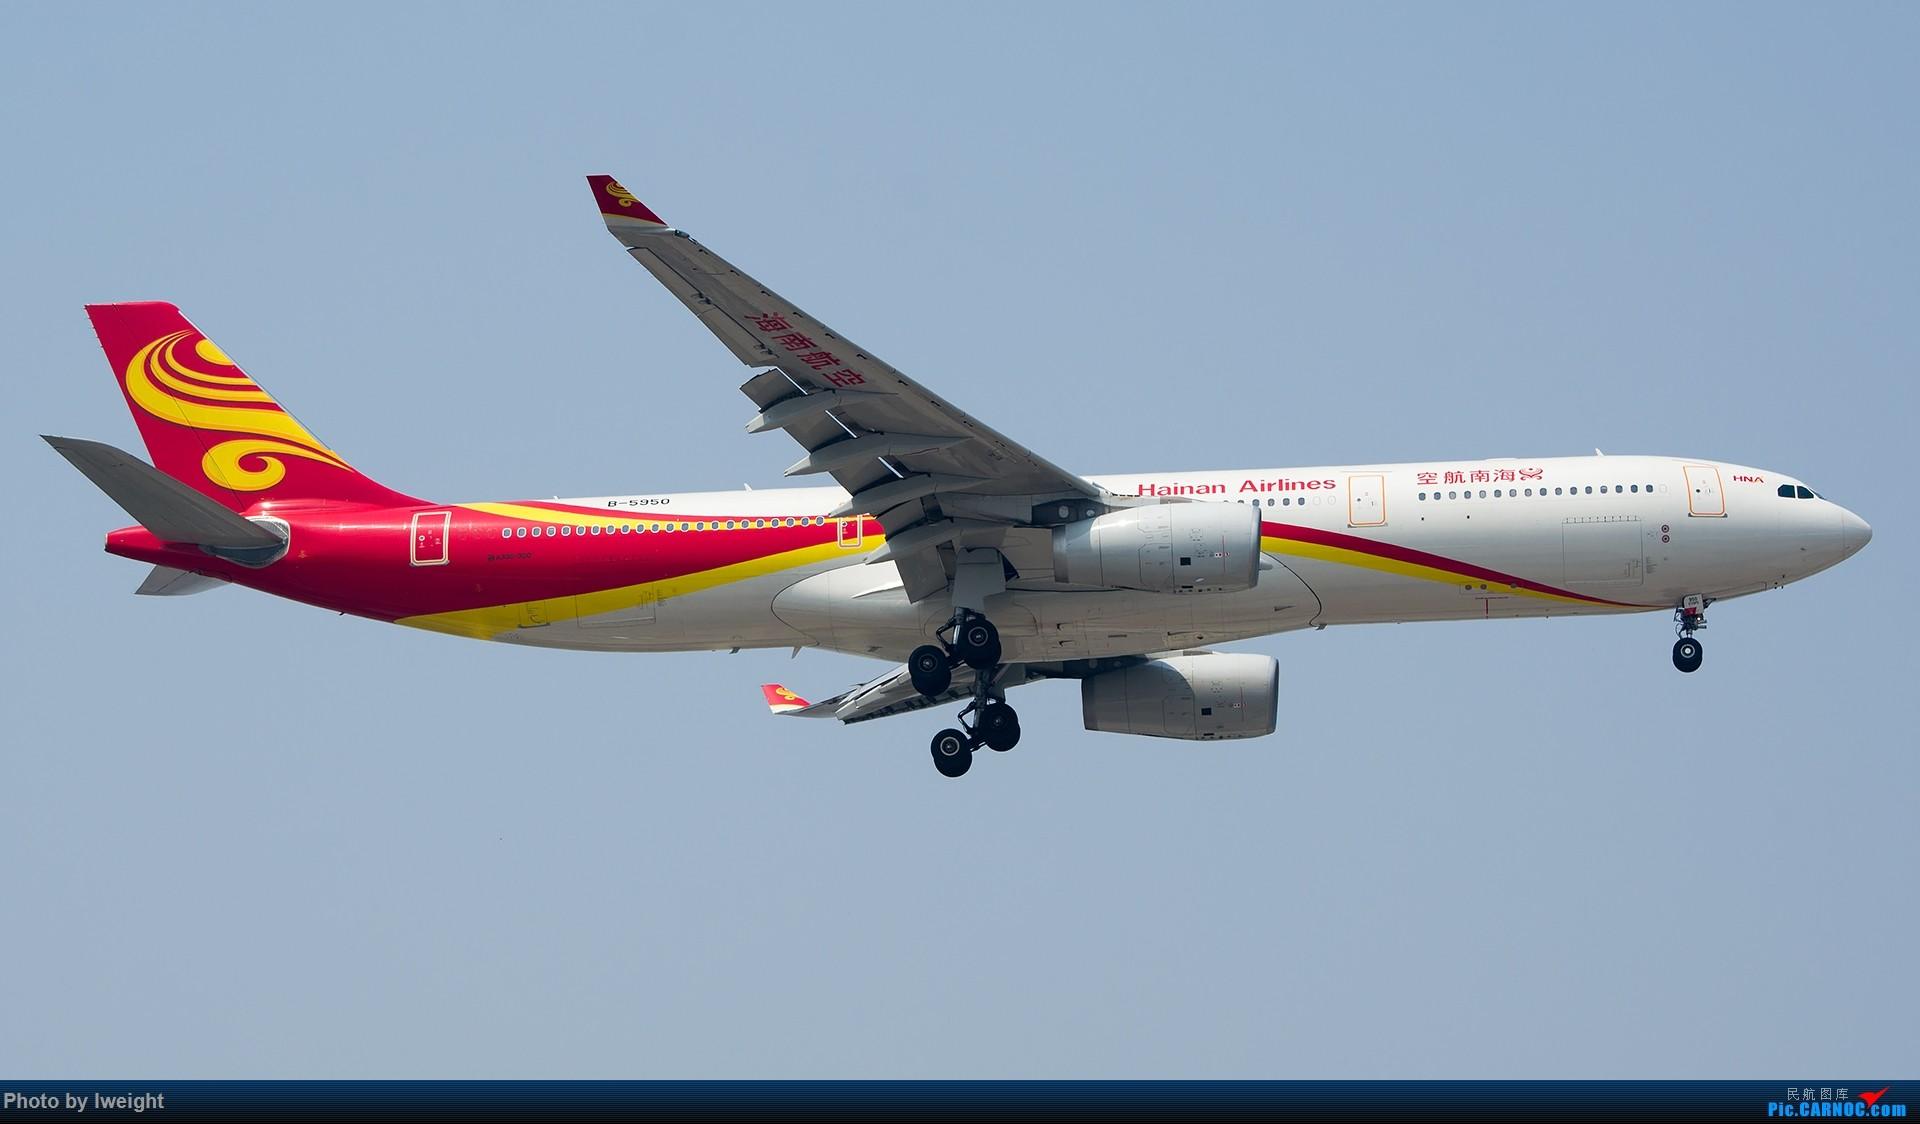 Re:[原创]周末帝都霾天拍机,凑合看看吧【2015-5-23】 AIRBUS A330-300 B-5950 中国北京首都国际机场